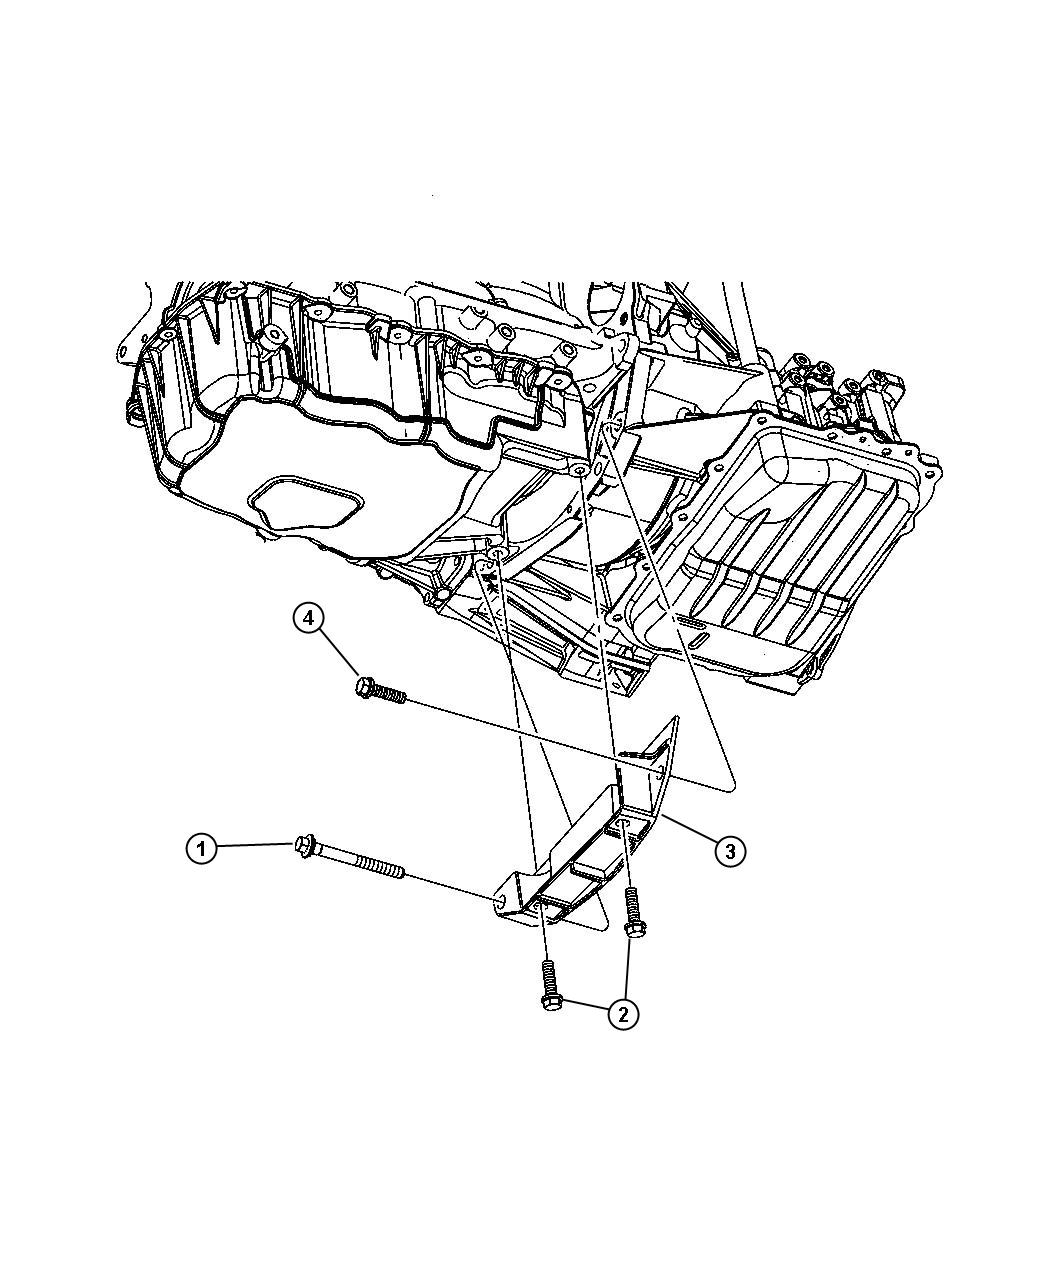 2003 Chrysler Pt Cruiser Collar. Structural. Oil pan to